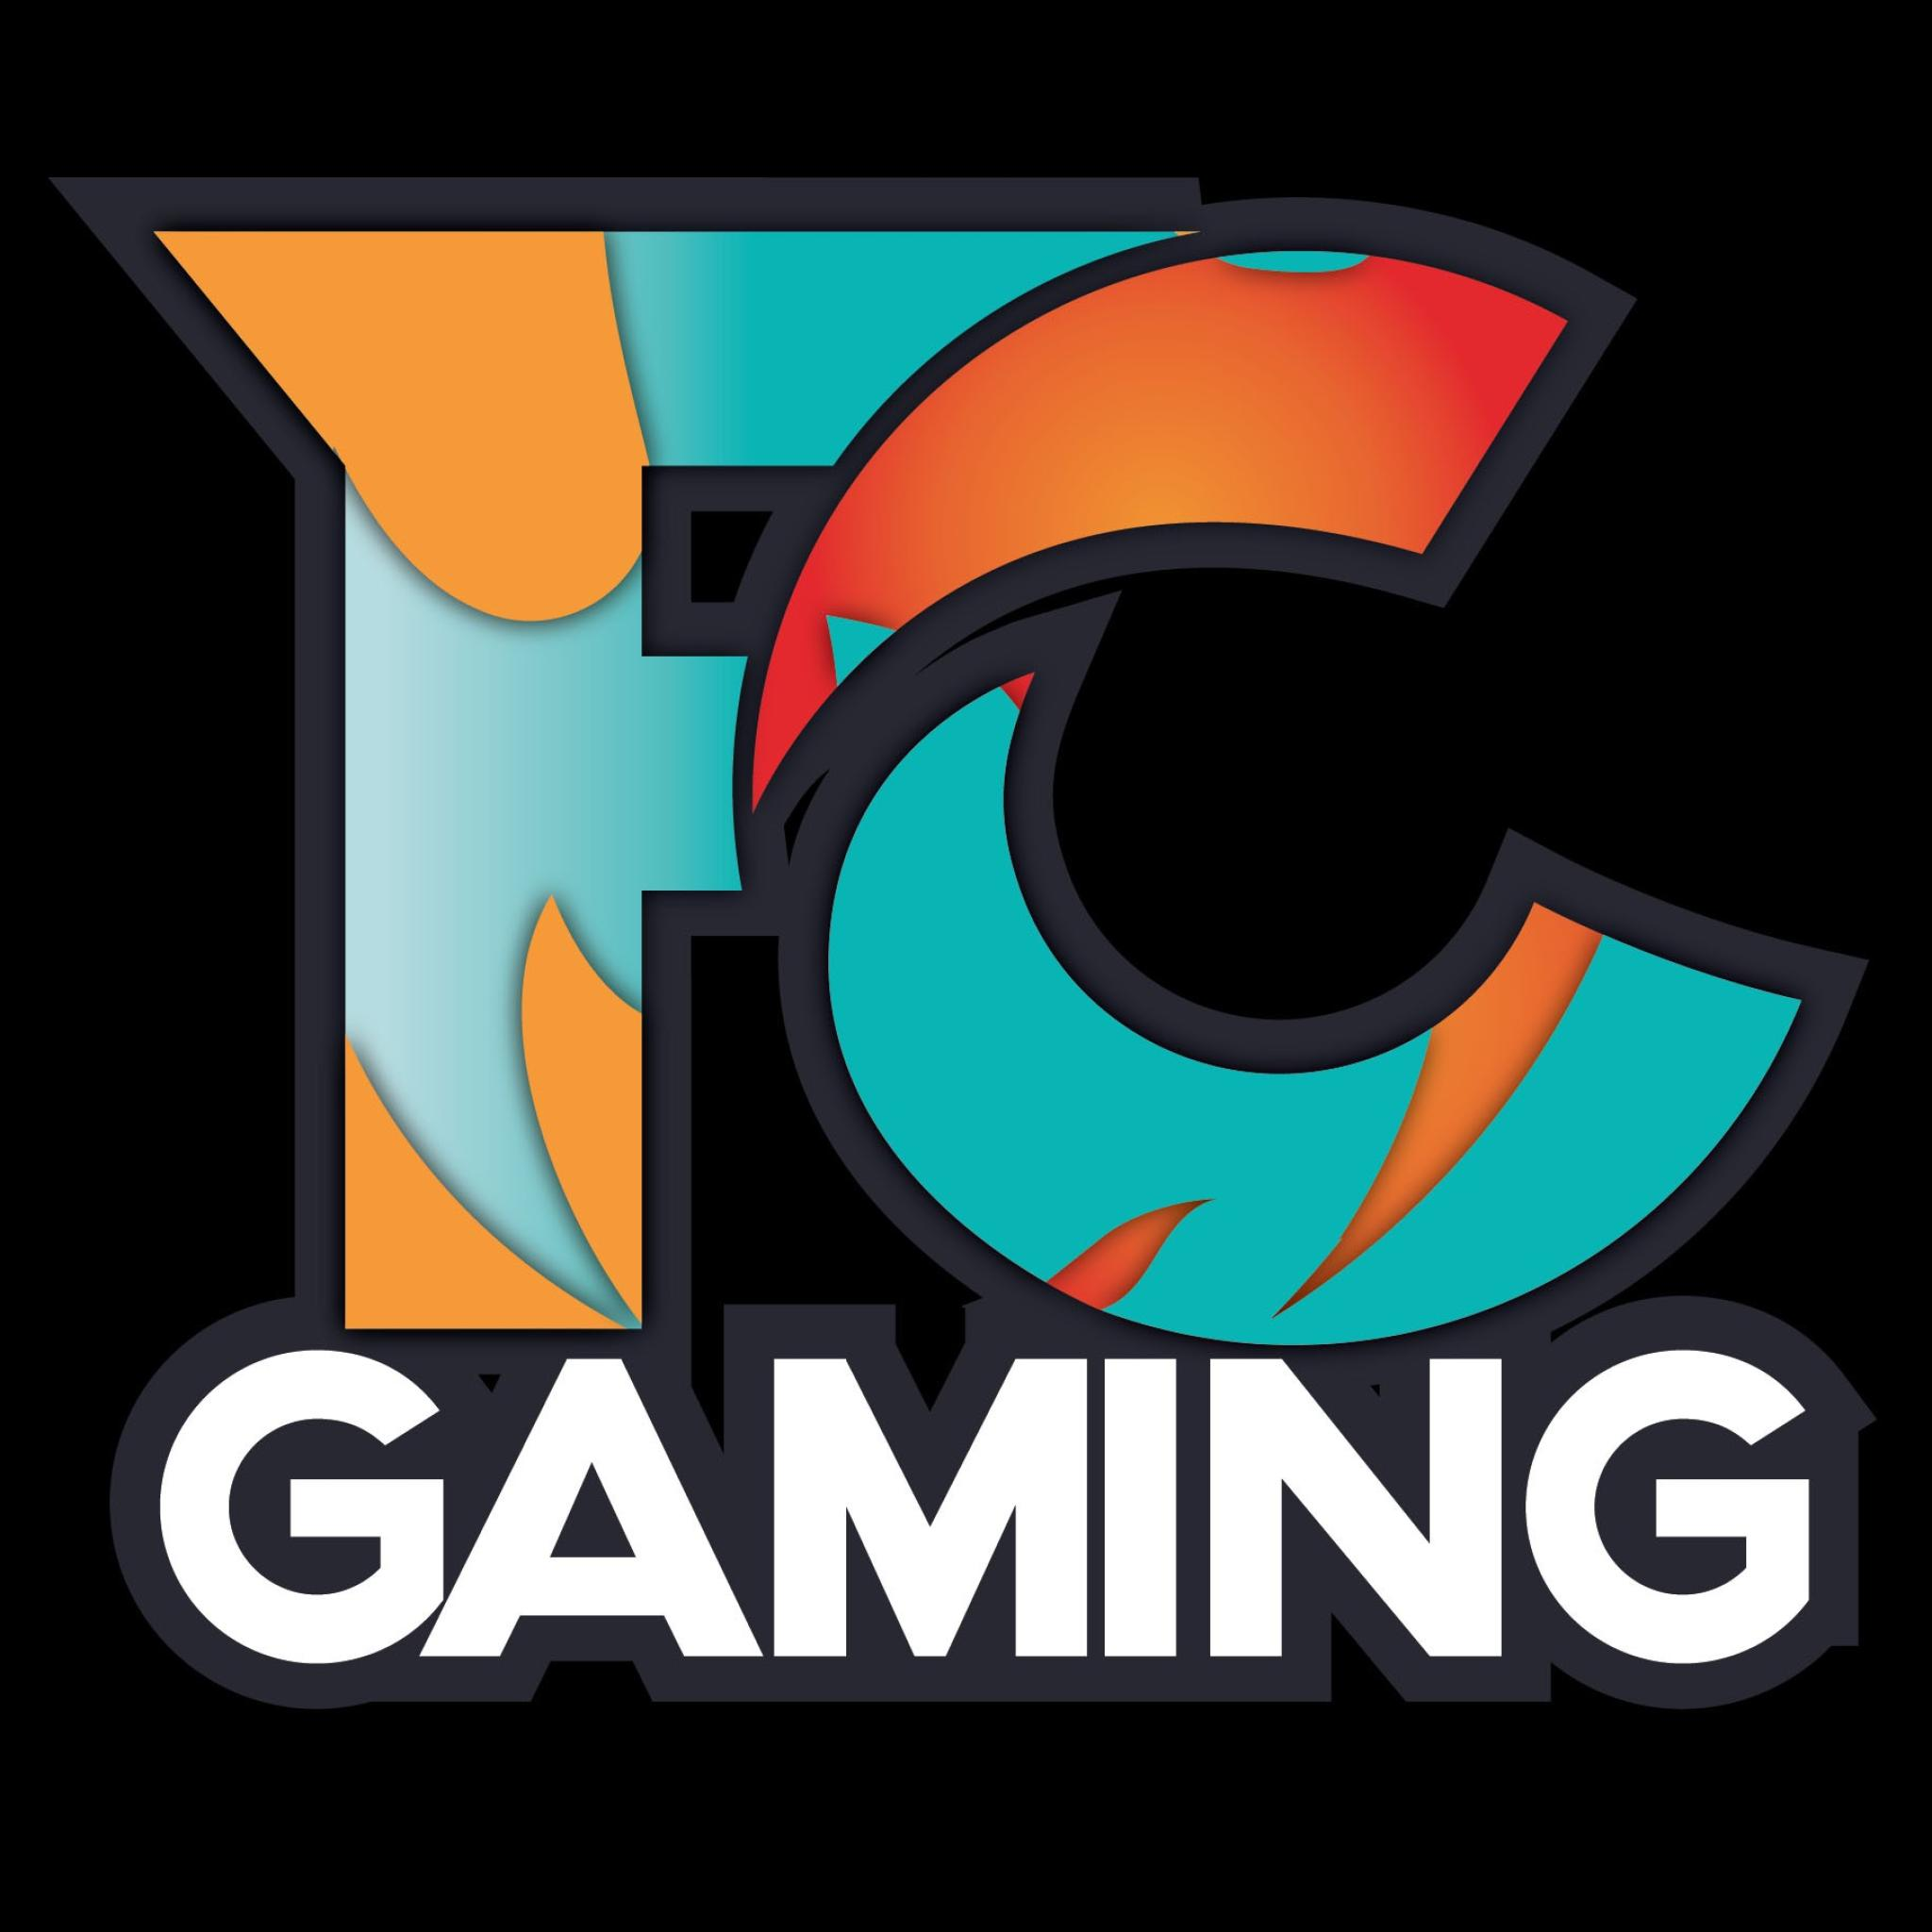 FC Gaming